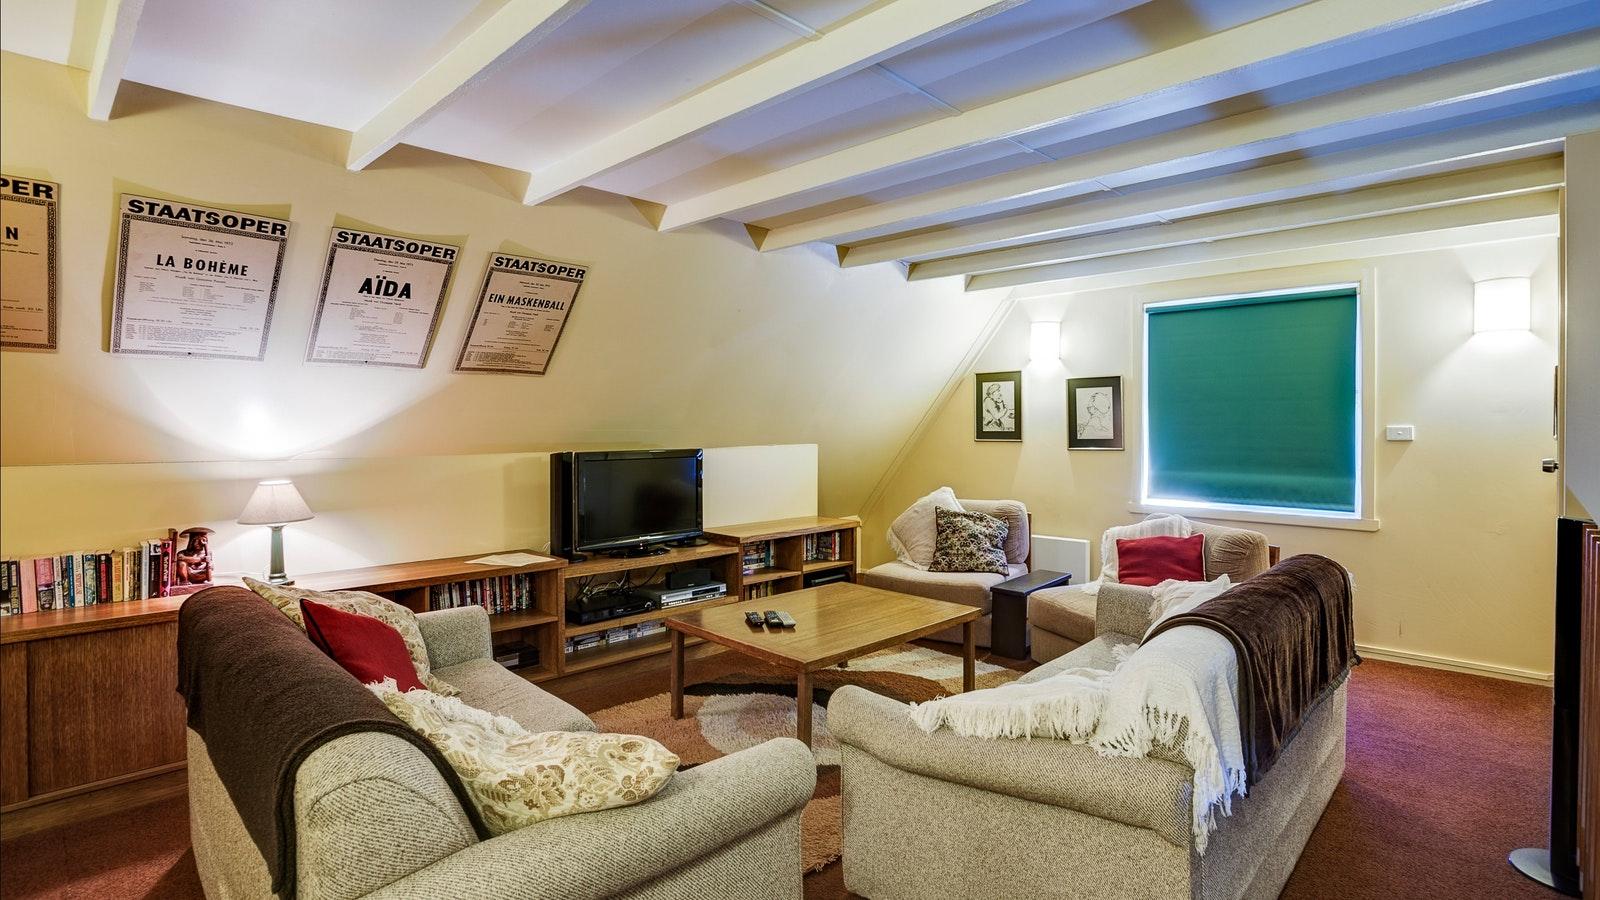 Attic lounge room